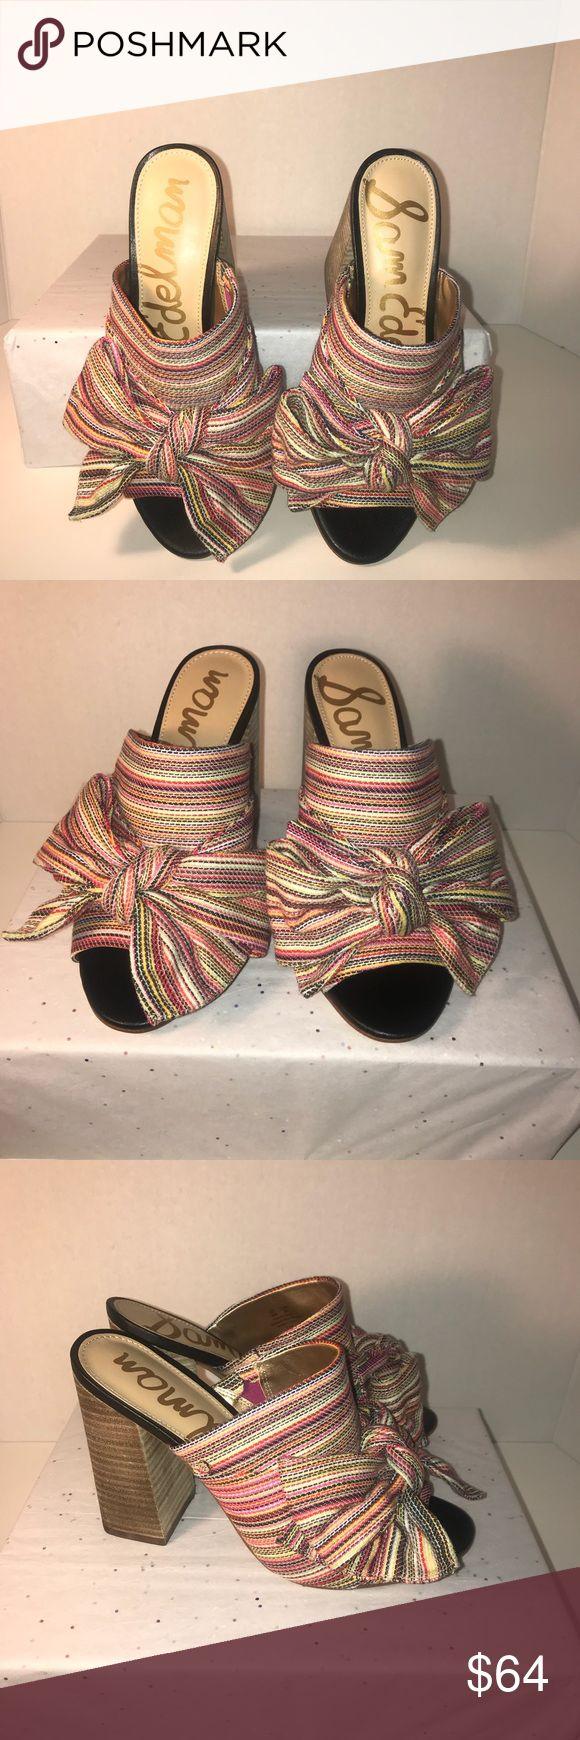 Sam Edelman Yumi Bow Open Toe Mule Sam Edelman Yumi Multicolored Woven Stripe Block Heeled Mule Sandal Sam Edelman Shoes Mules & Clogs